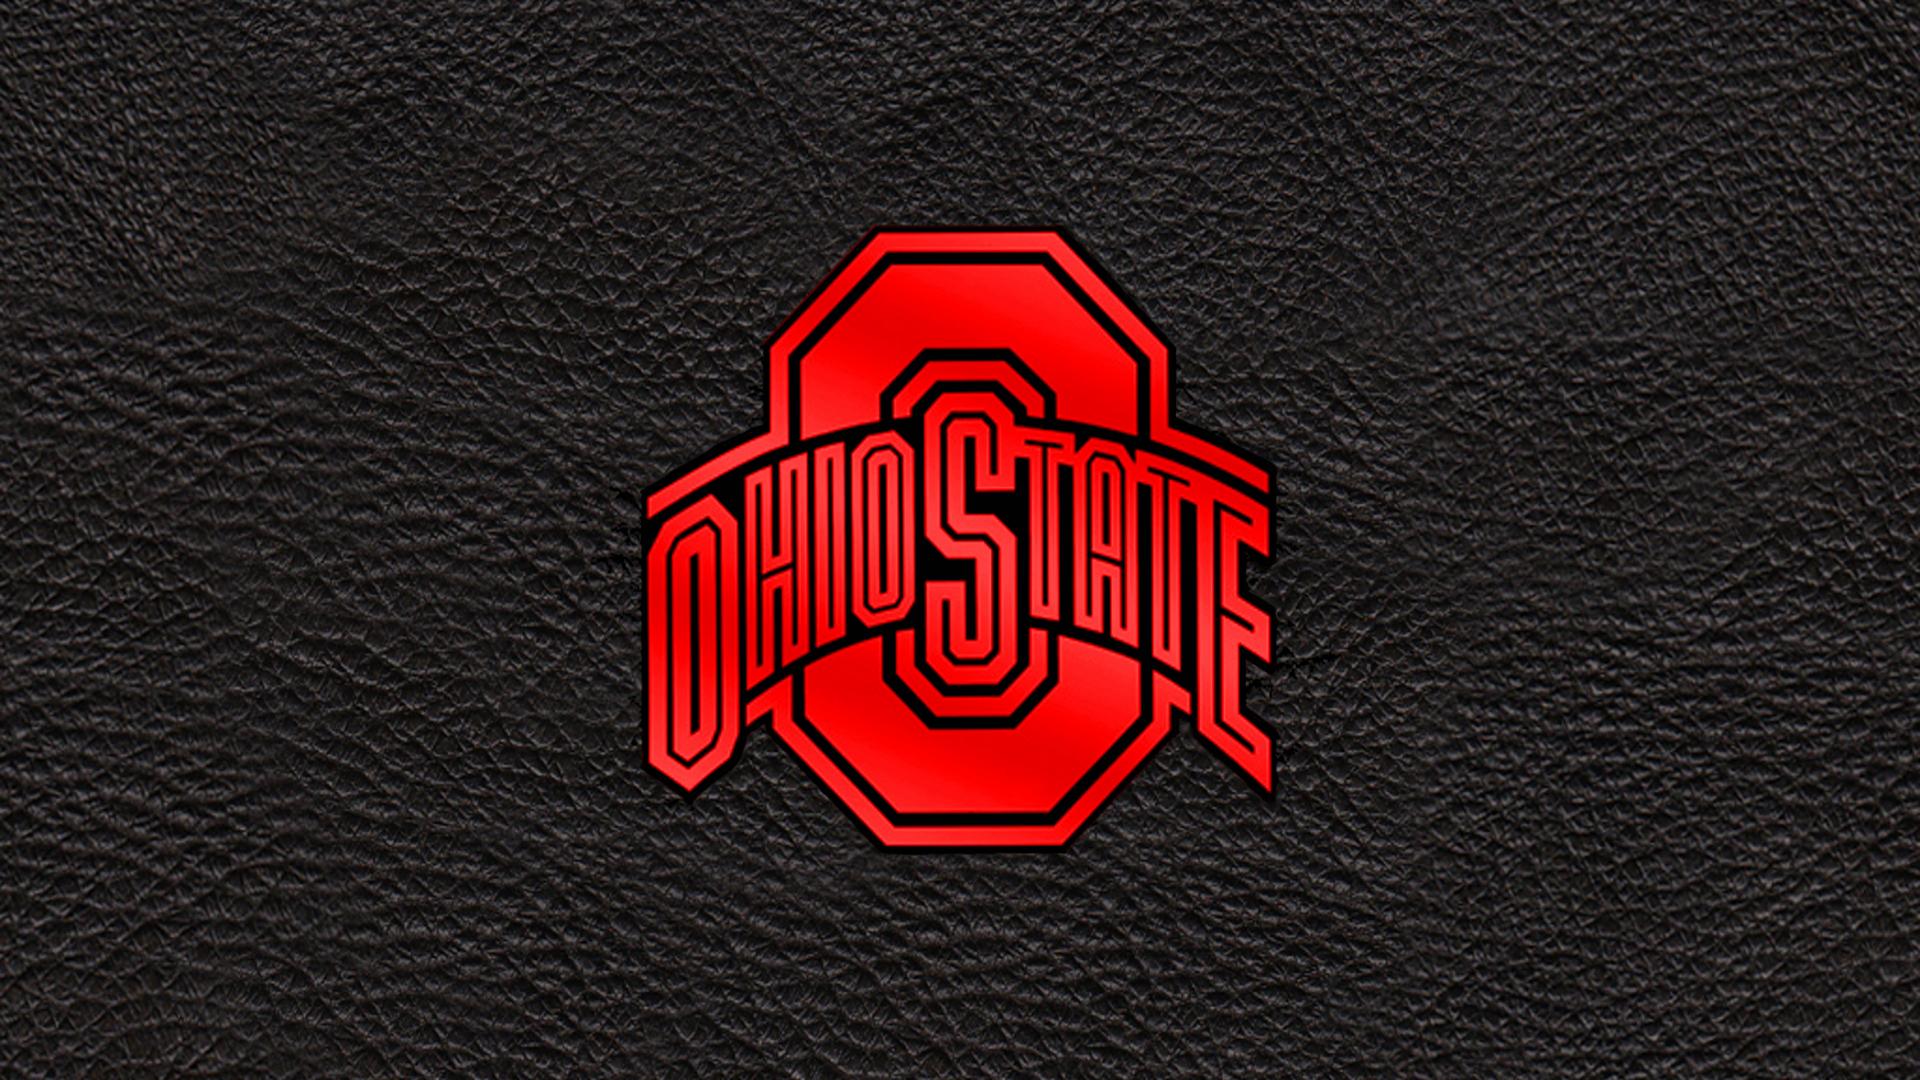 Ohio State Buckeyes 1920x1080